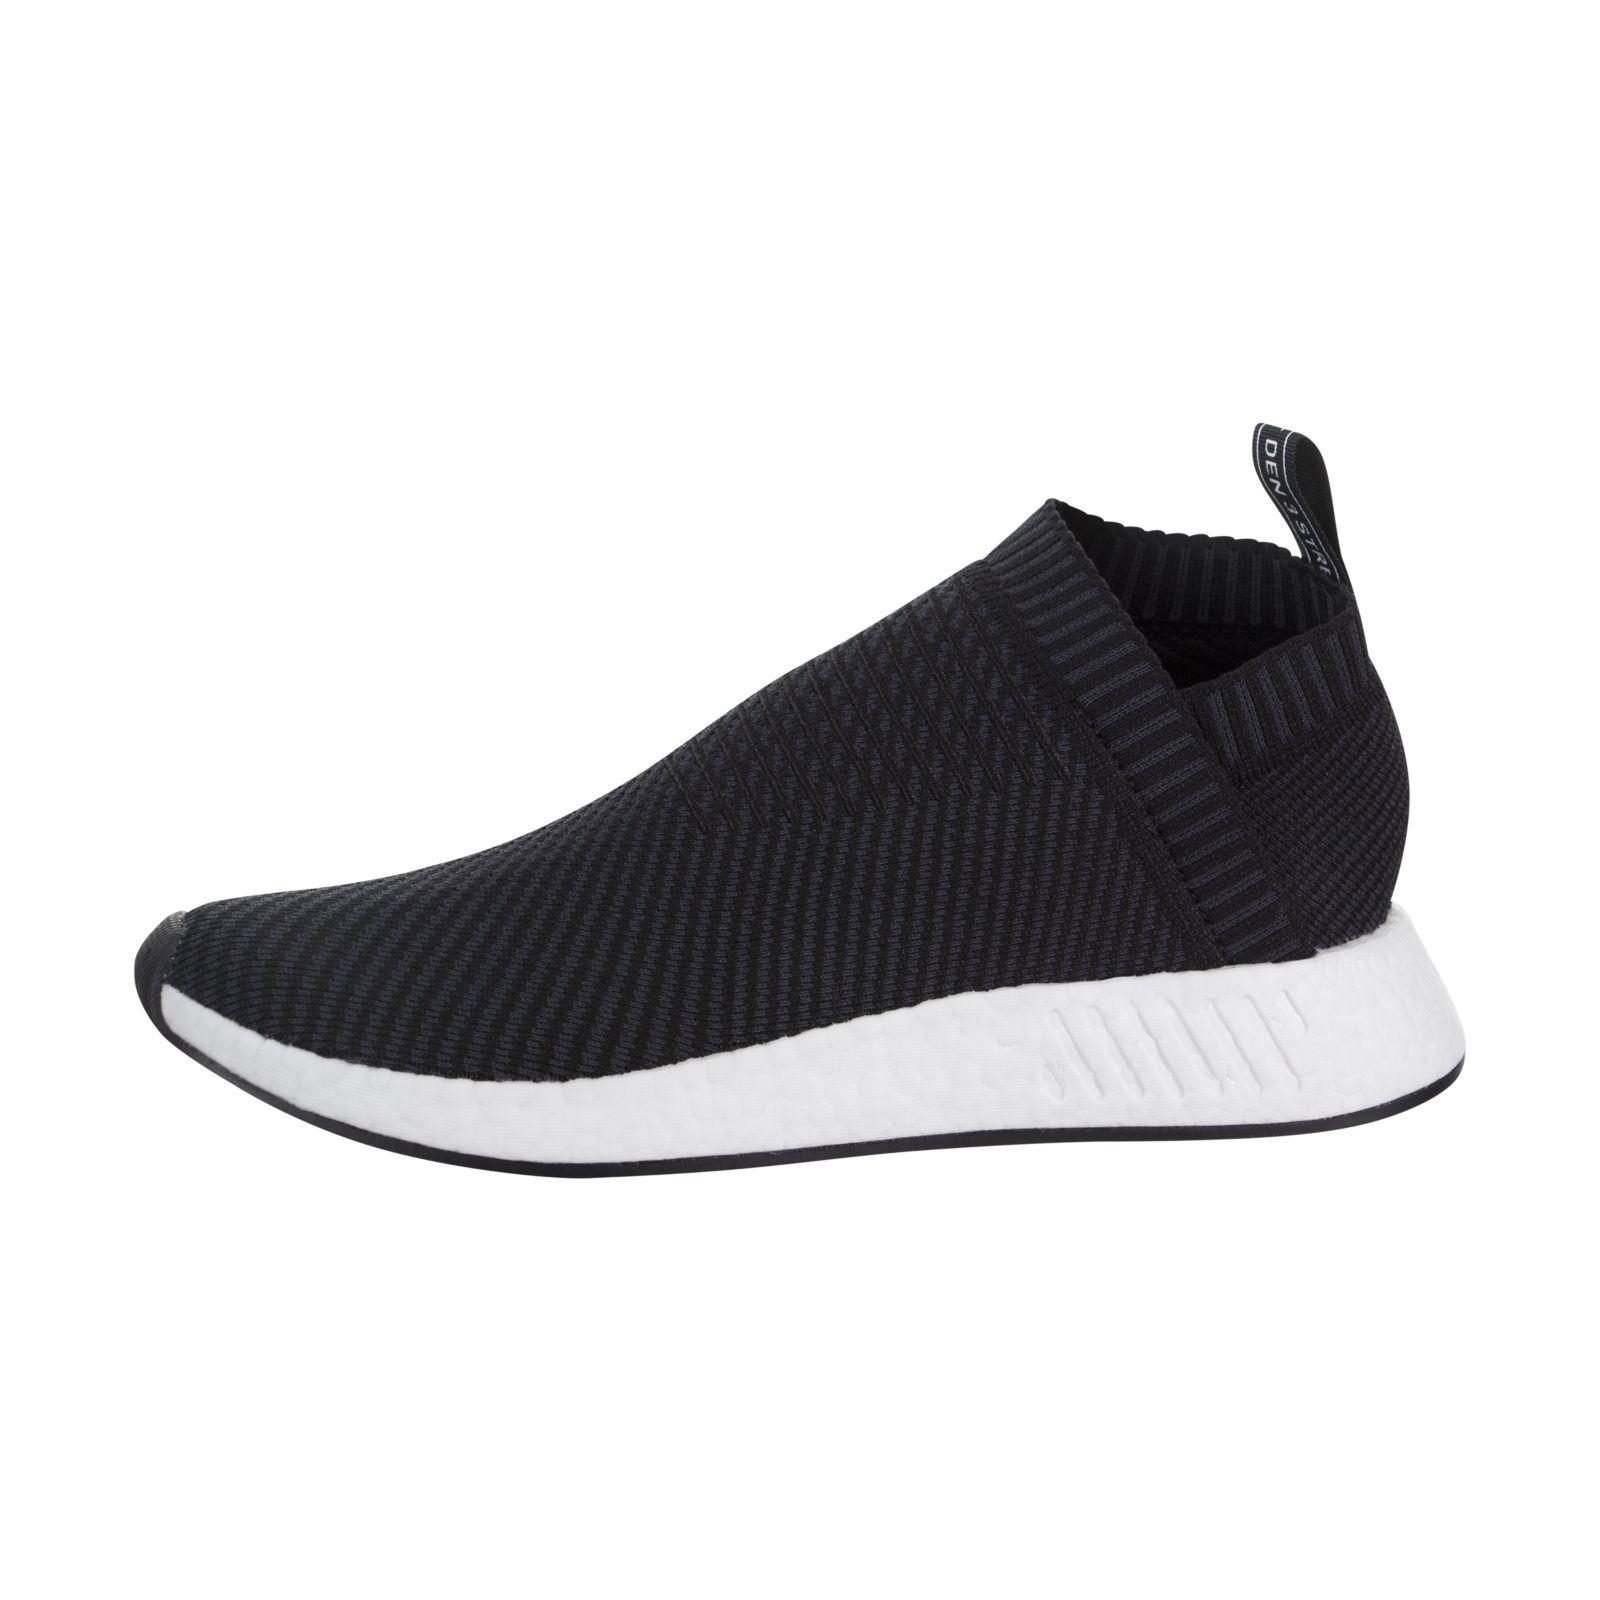 monsieur madame: adidas nmd_cs2 nmd_cs2 adidas primeknit : bonnes marchandises 4c09e7